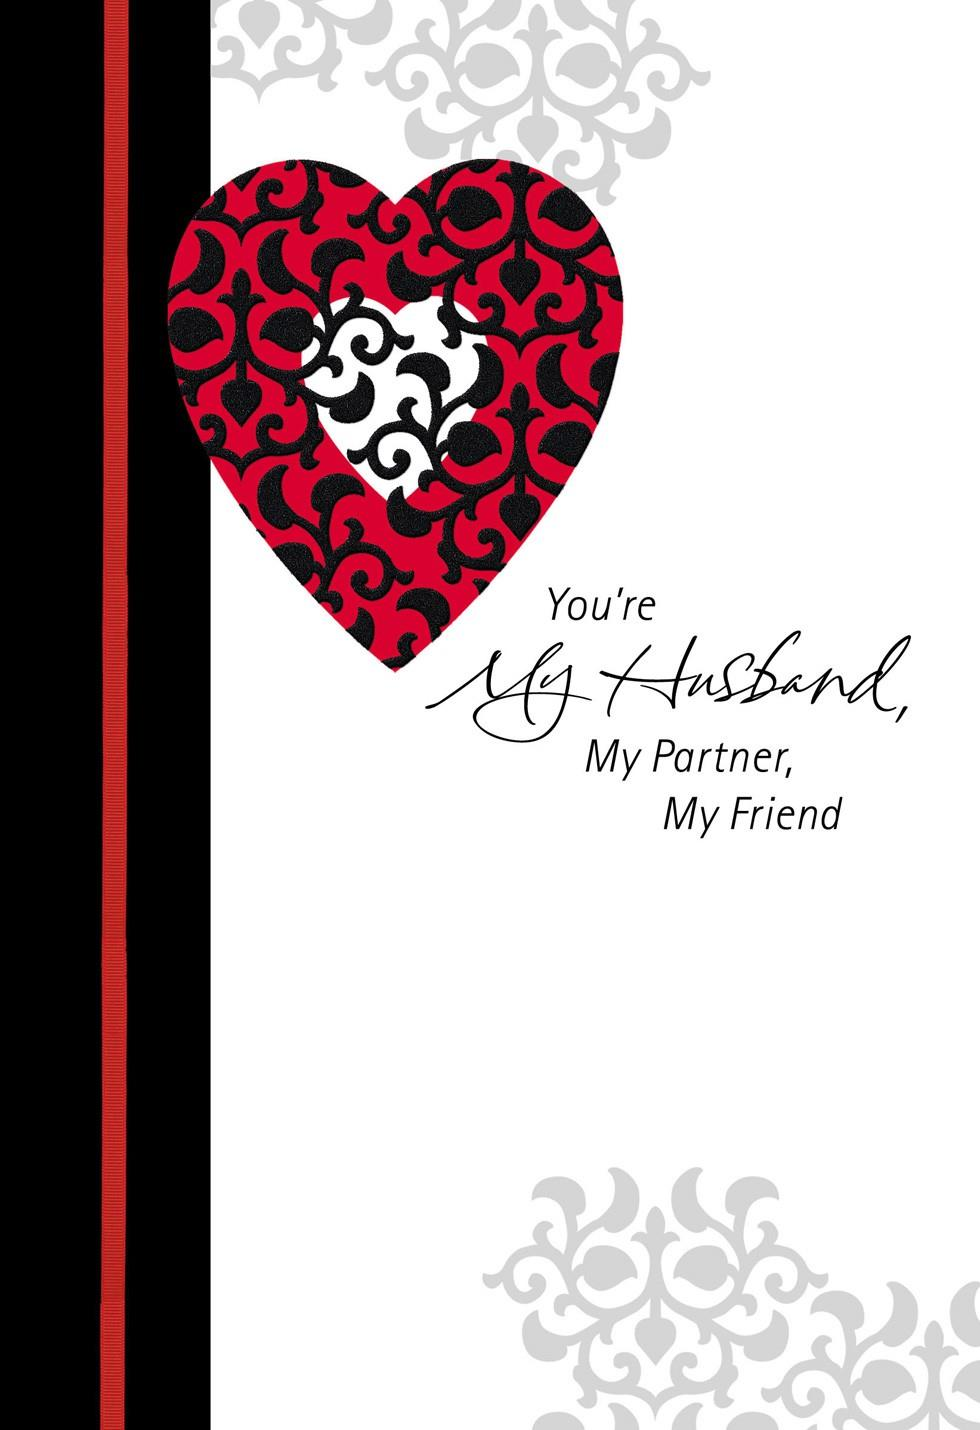 Husband Partner Friend Valentines Day Card Greeting Cards – Valentines Day Card for Husband